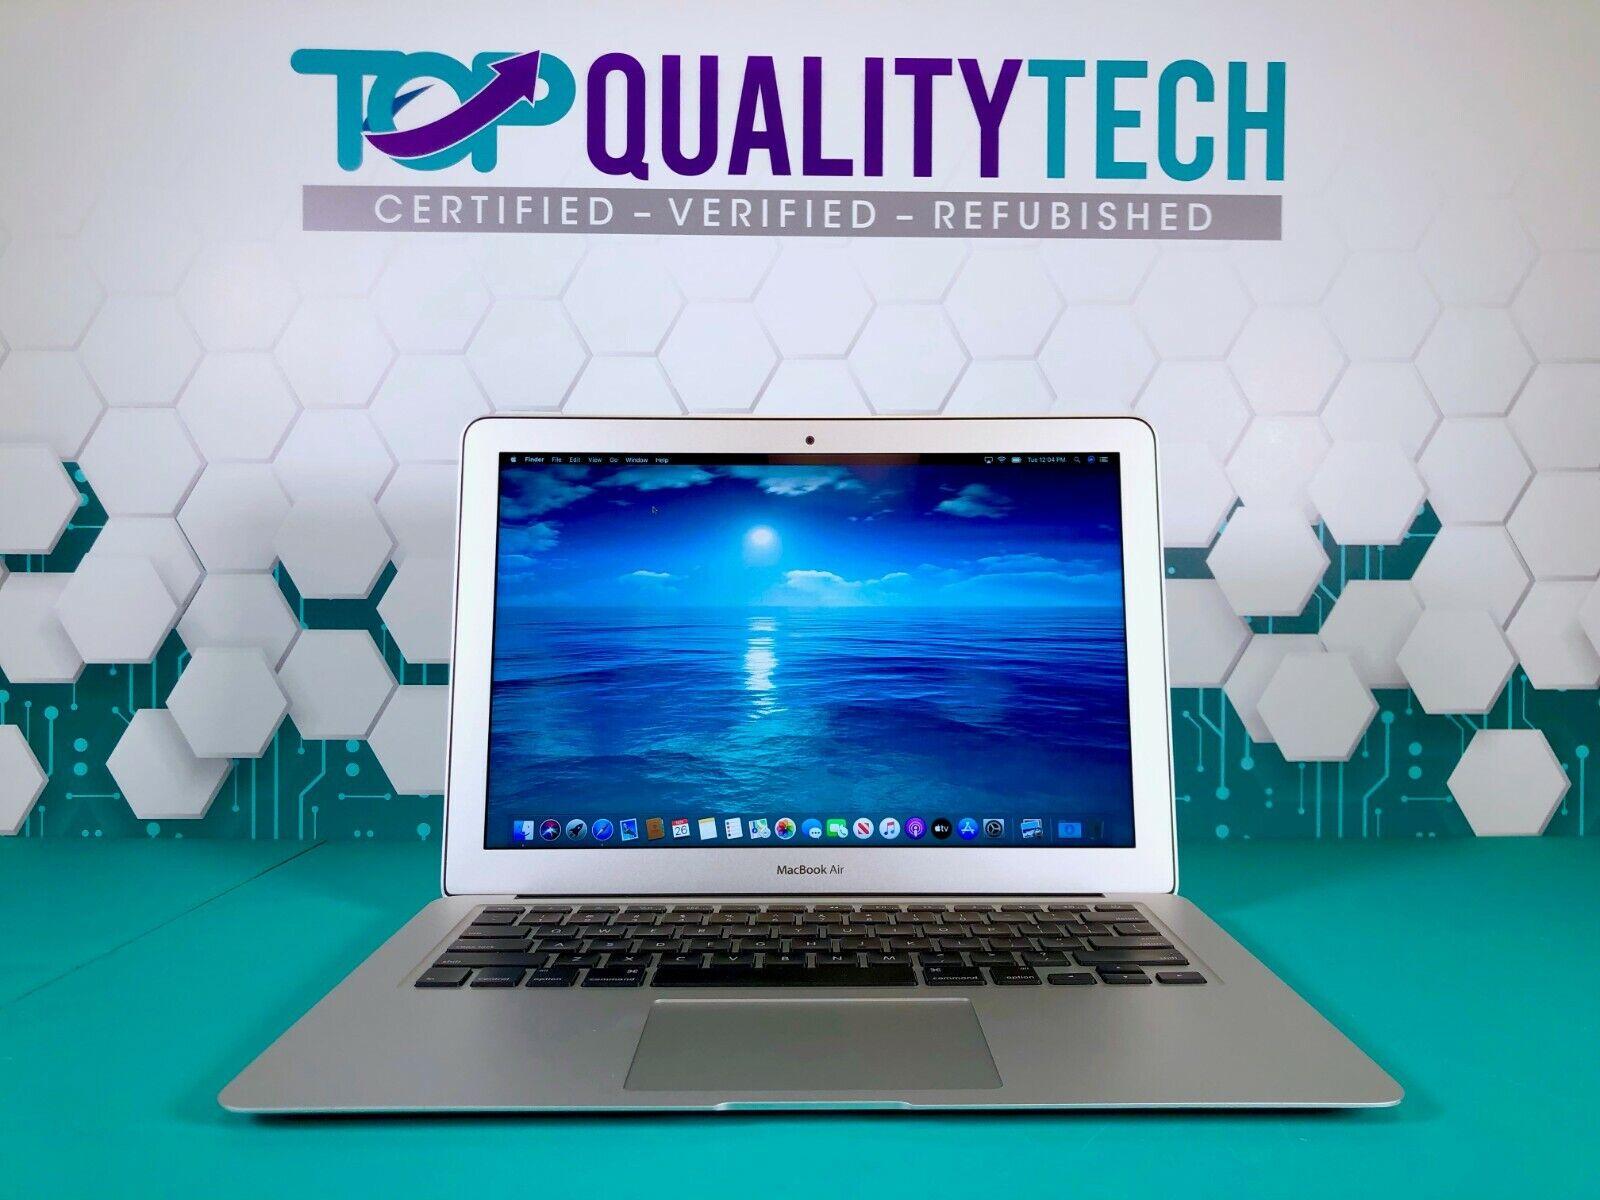 Apple MacBook Air 13 inch Laptop / 3 YEAR WARRANTY / 256GB SSD + BONUS / OS2019. Buy it now for 599.00